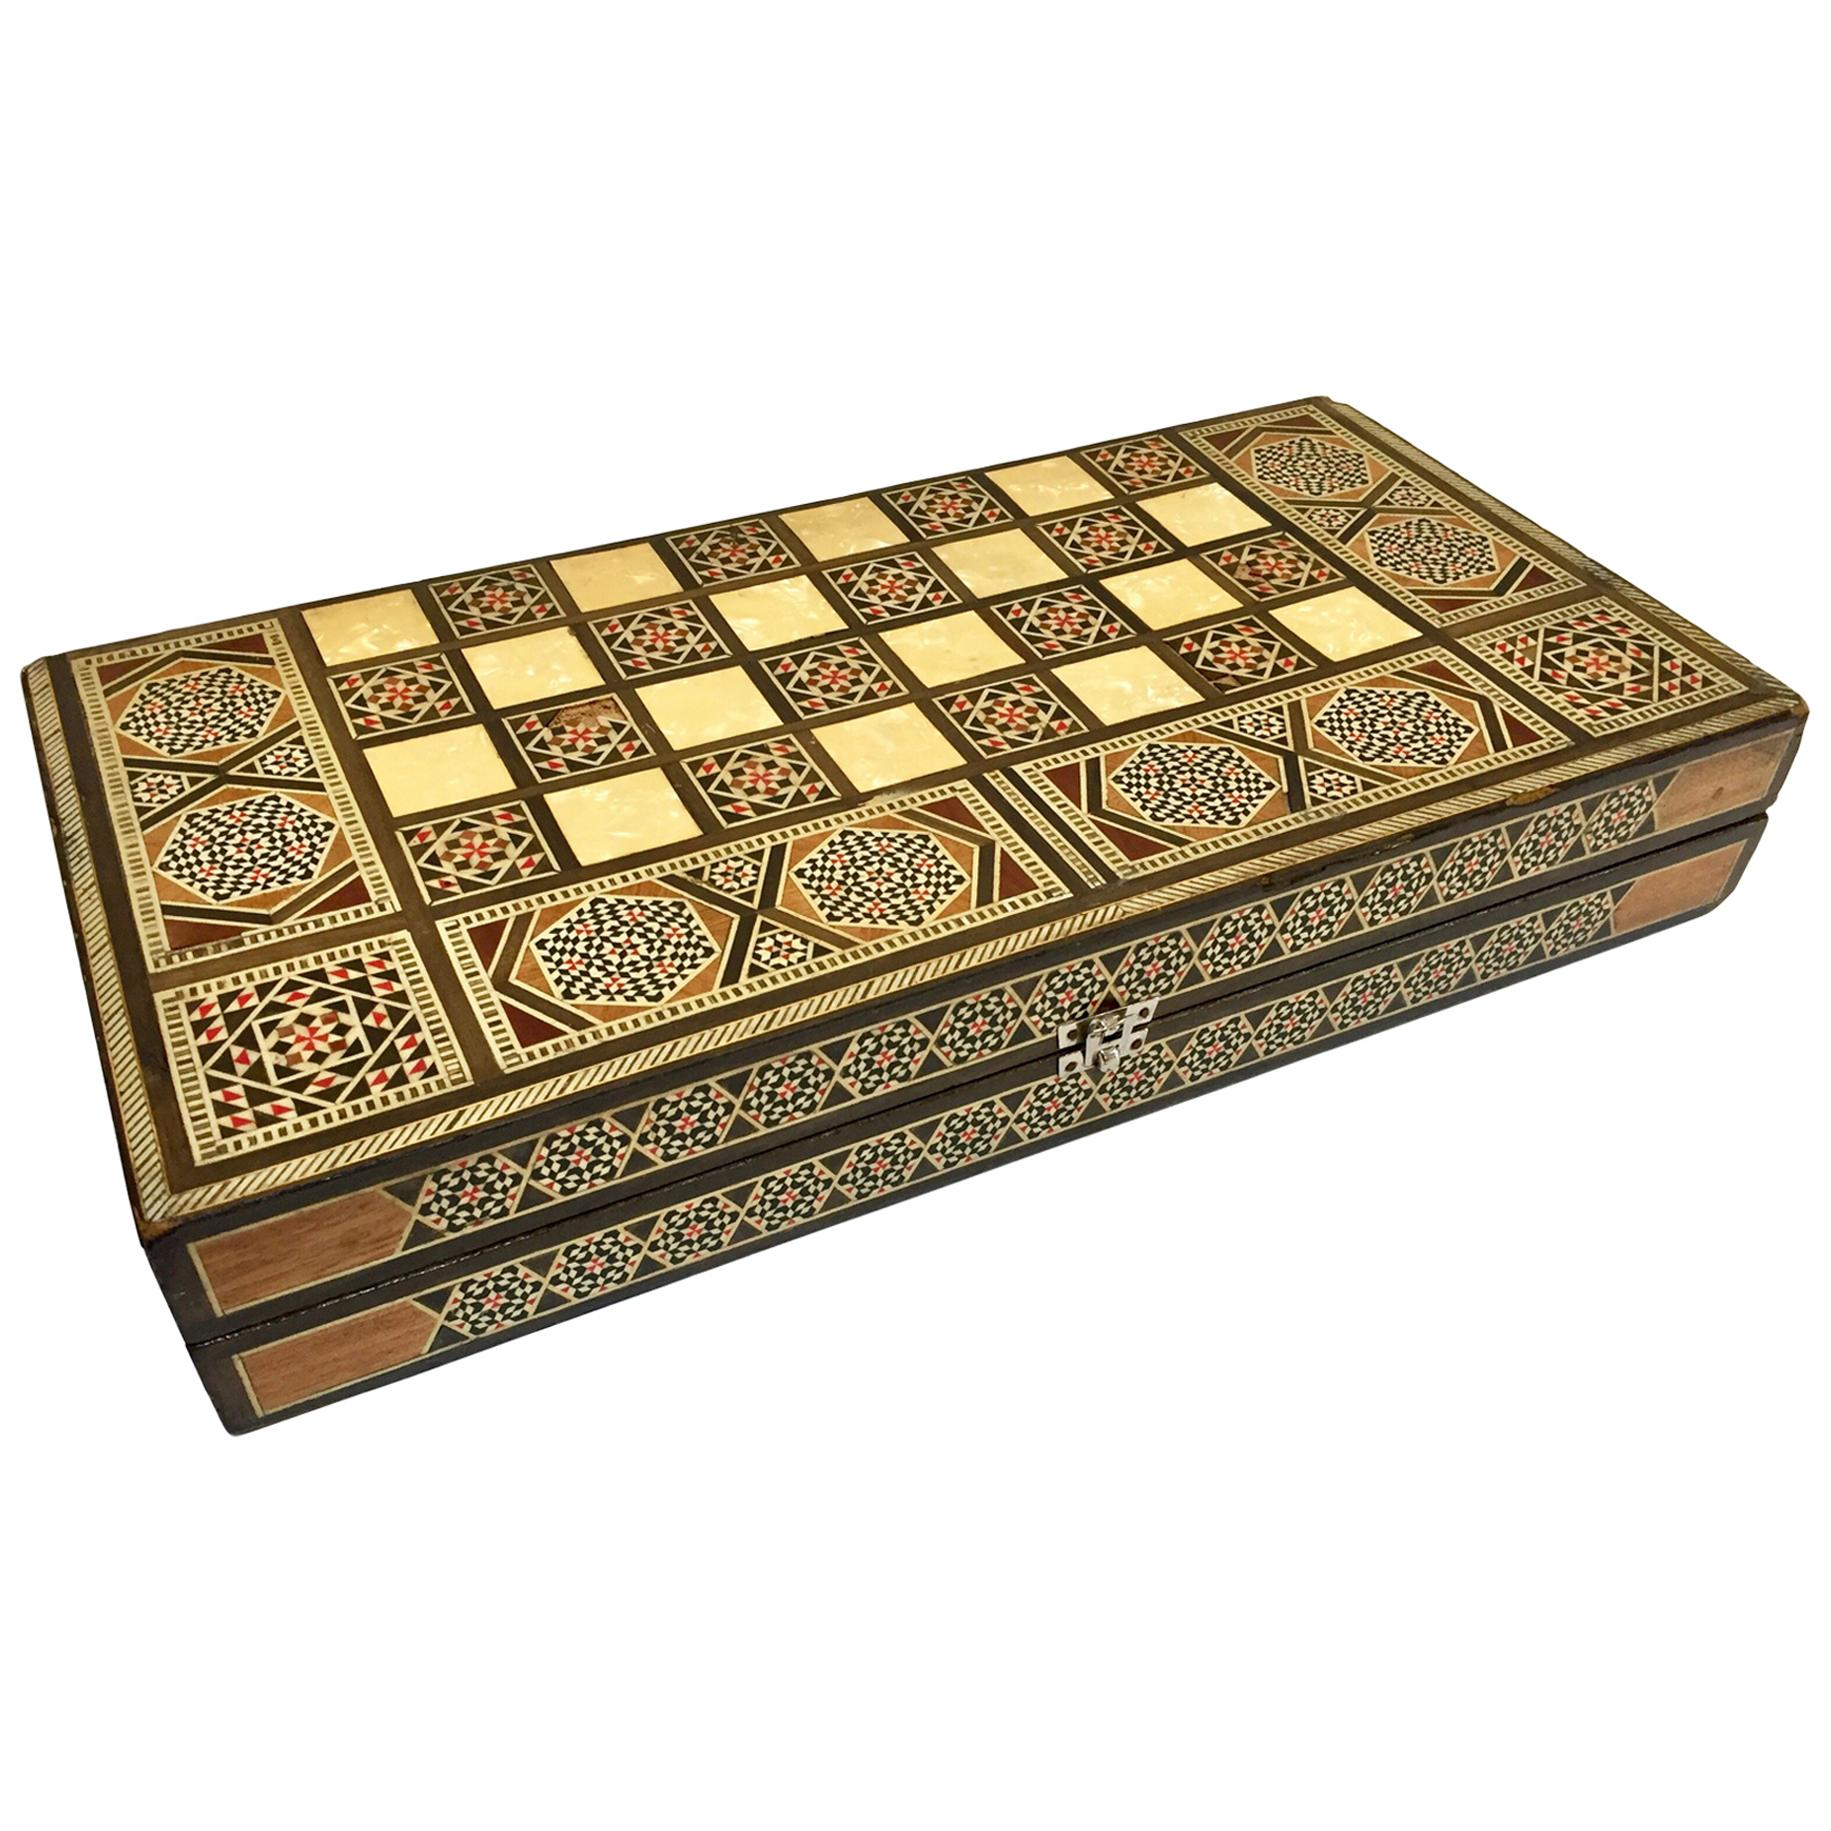 Backgammon-Mosaic-Syrian marquetry--High quality-mosaic Chess board